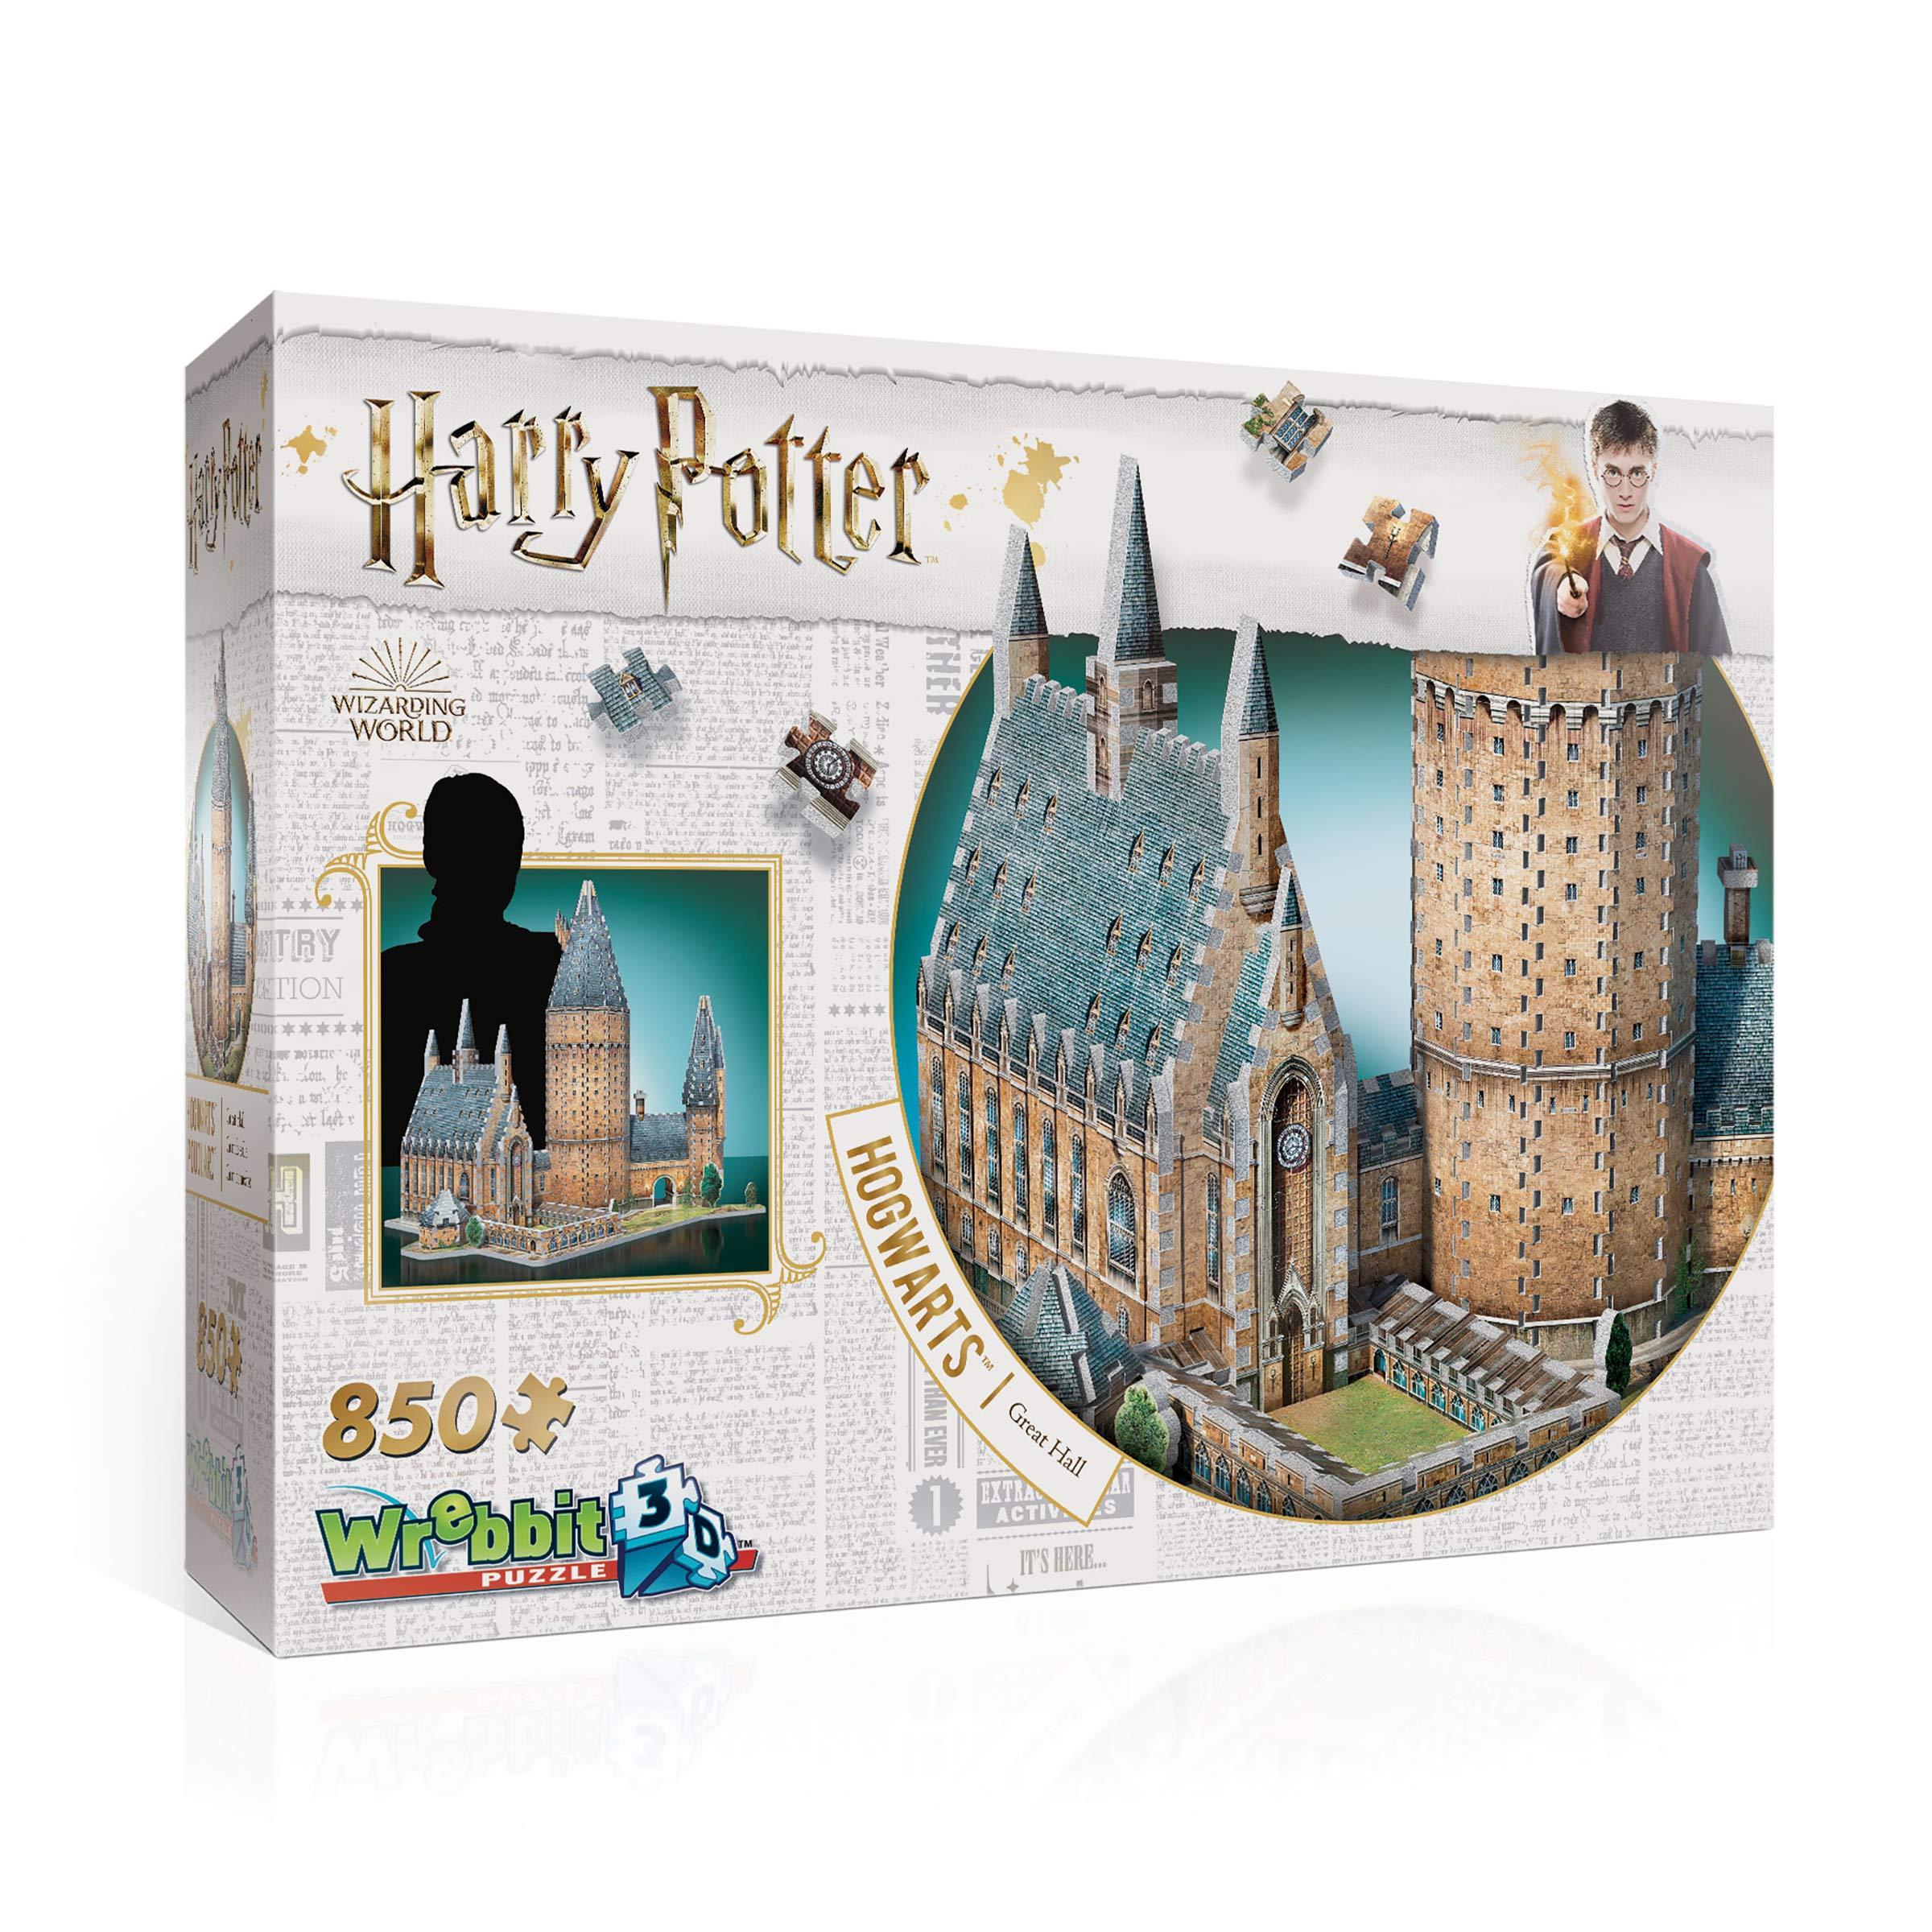 WREBBIT 3D - Harry Potter Hogwarts Great Hall 3D Jigsaw Puzzle - 850Piece by WREBBIT 3D